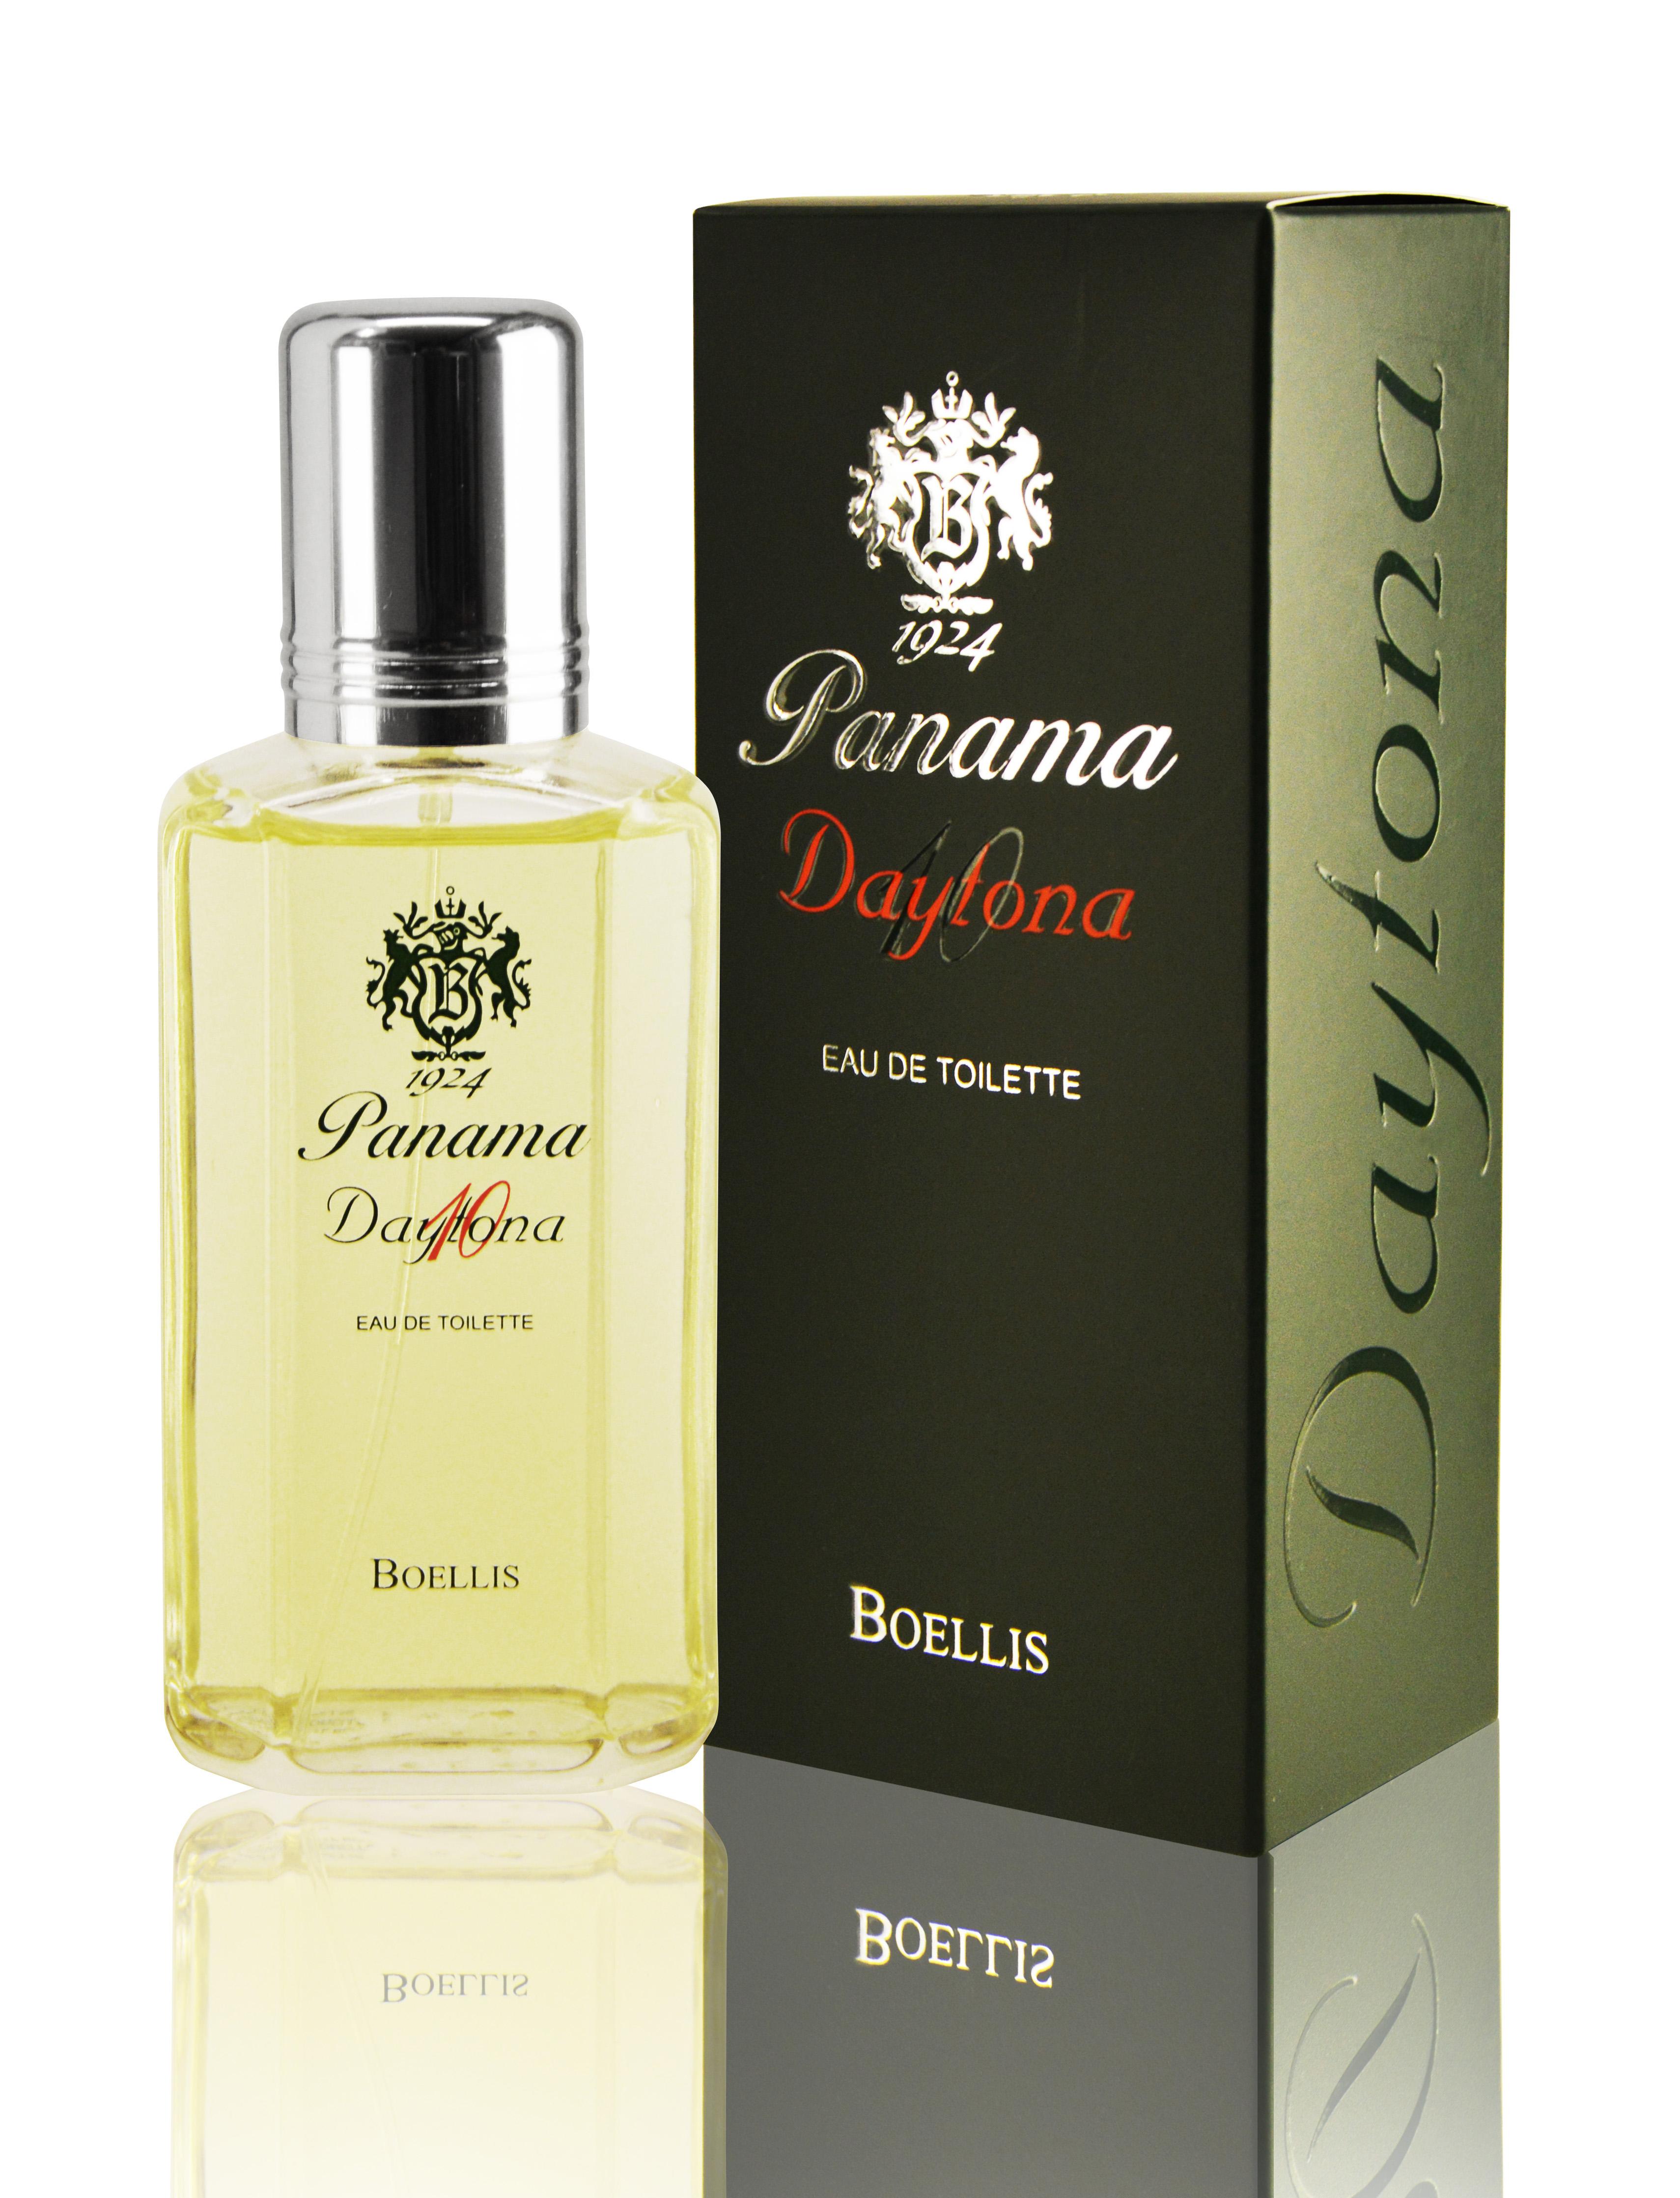 Boellis - Panama 1924 - Daytona Eau de Toilette 100 ml